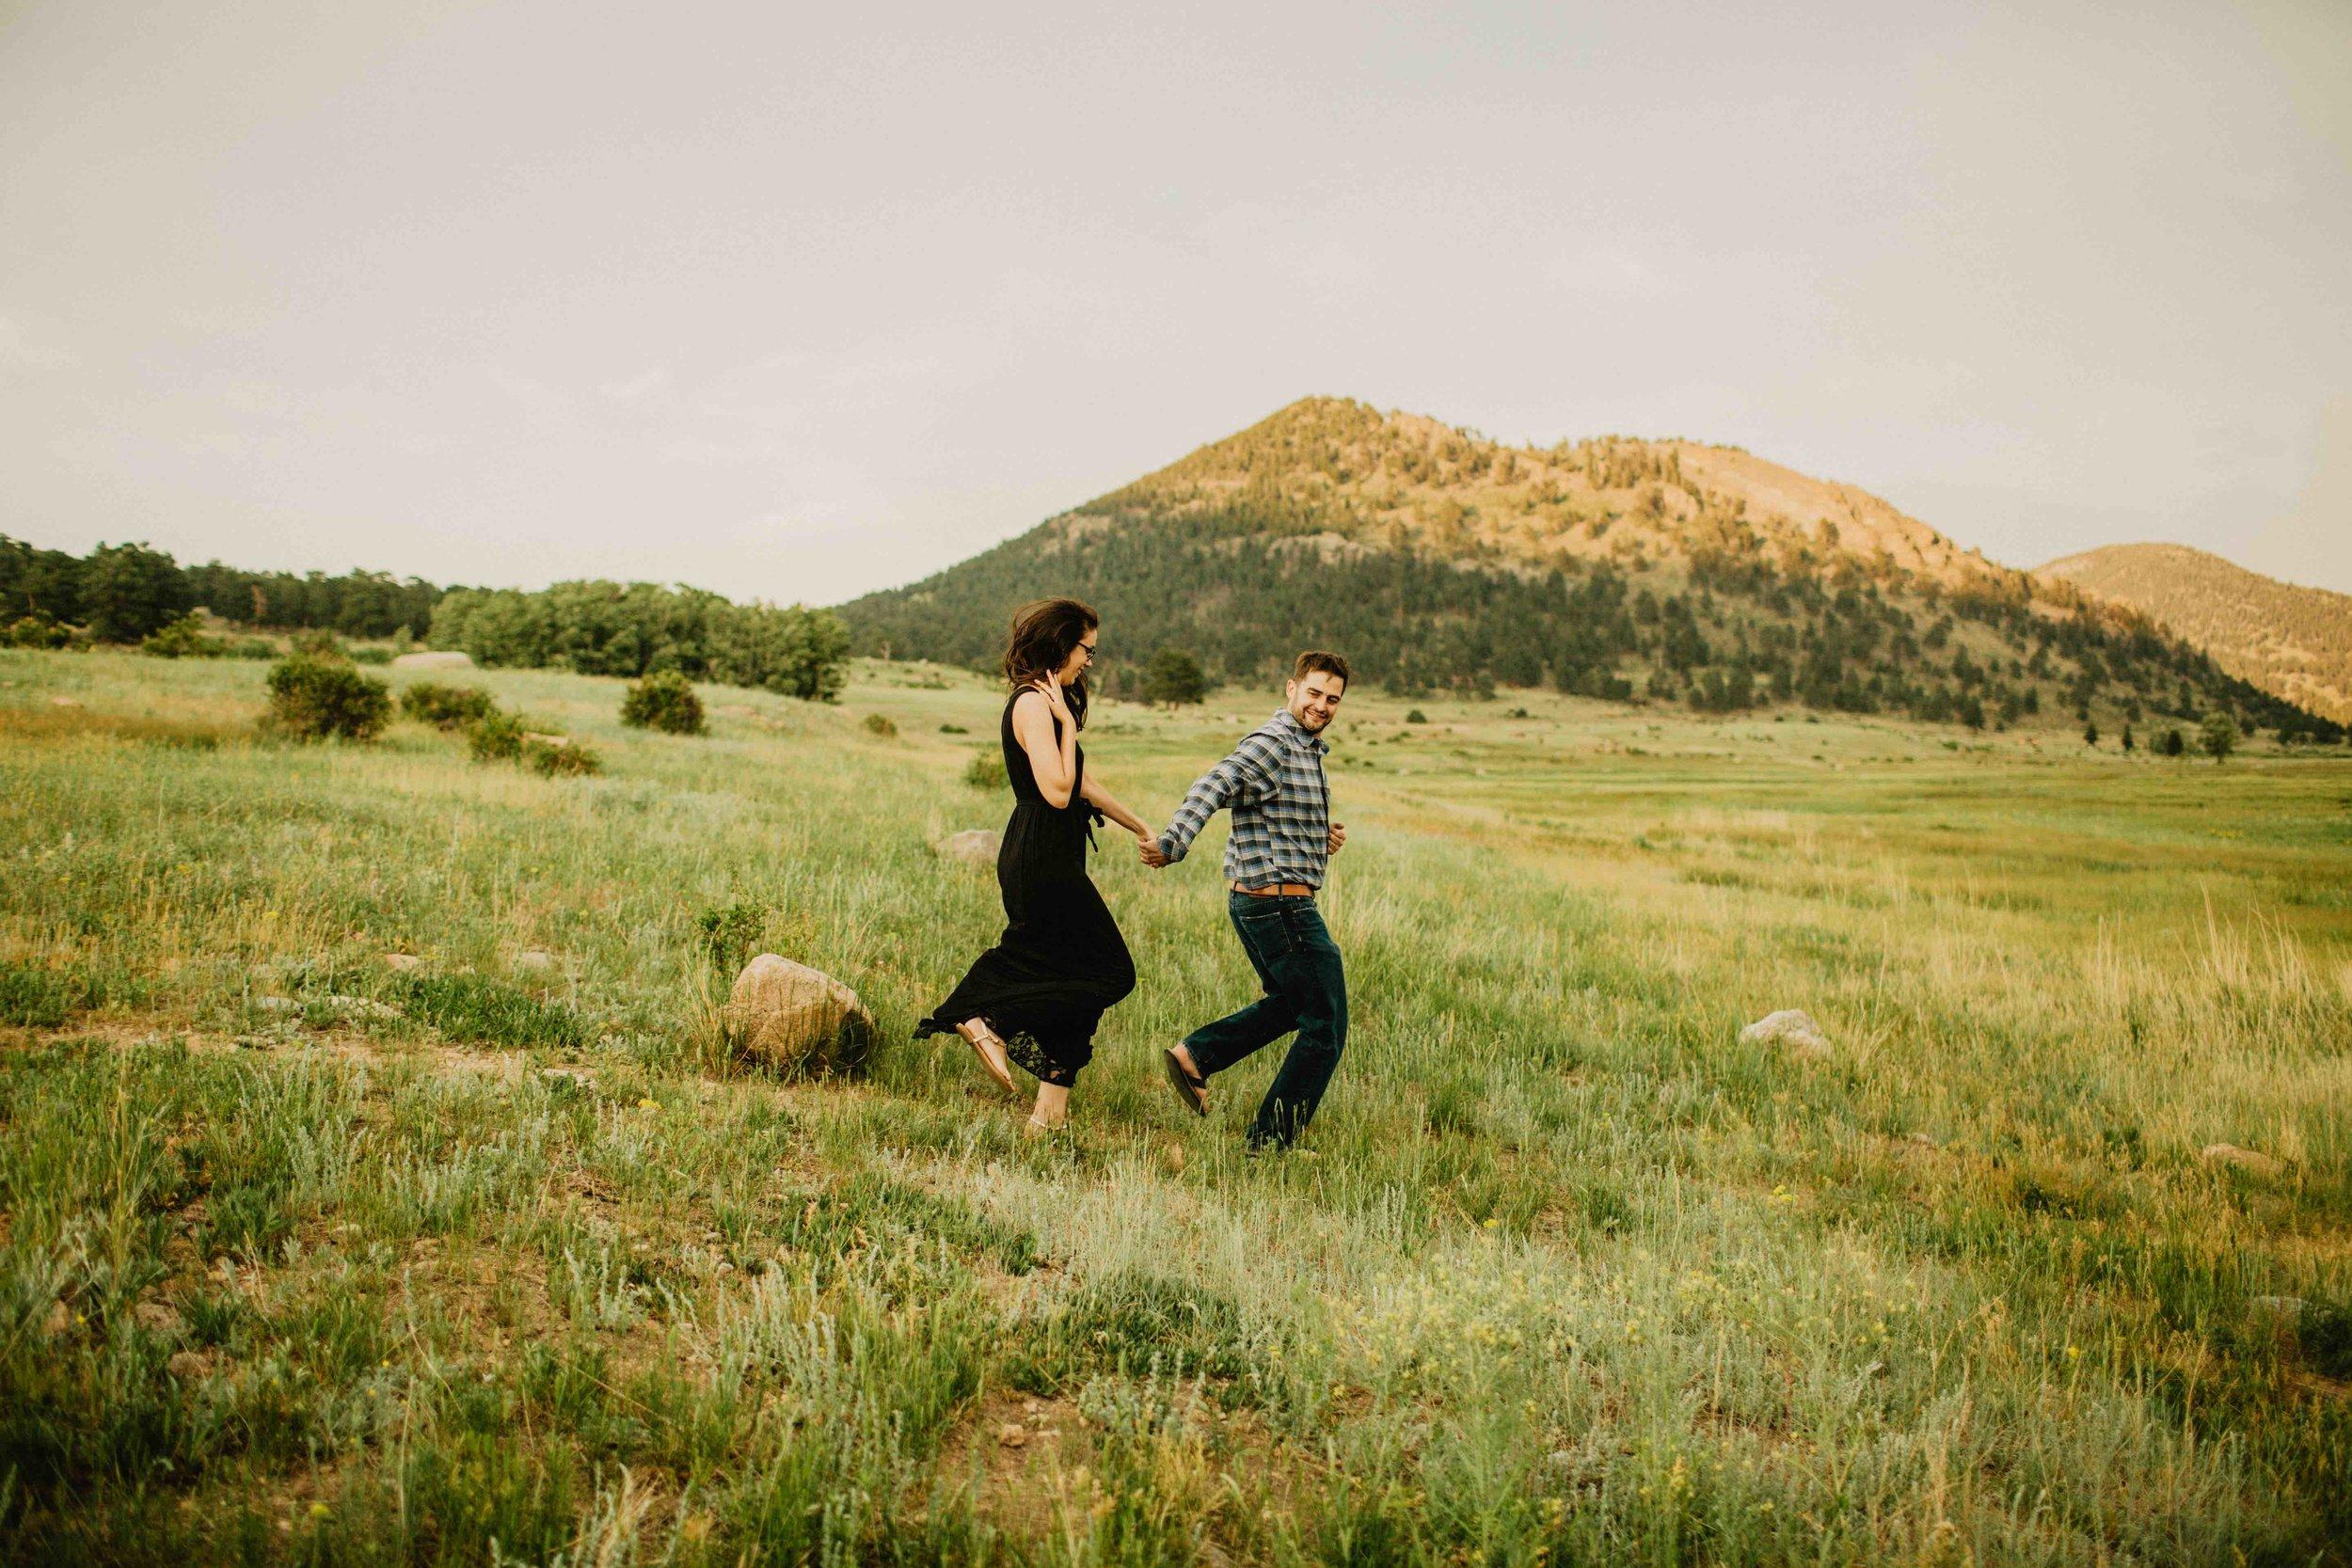 -colorado-wedding-photographer-denver-springs-vail-607A5033.jpeg